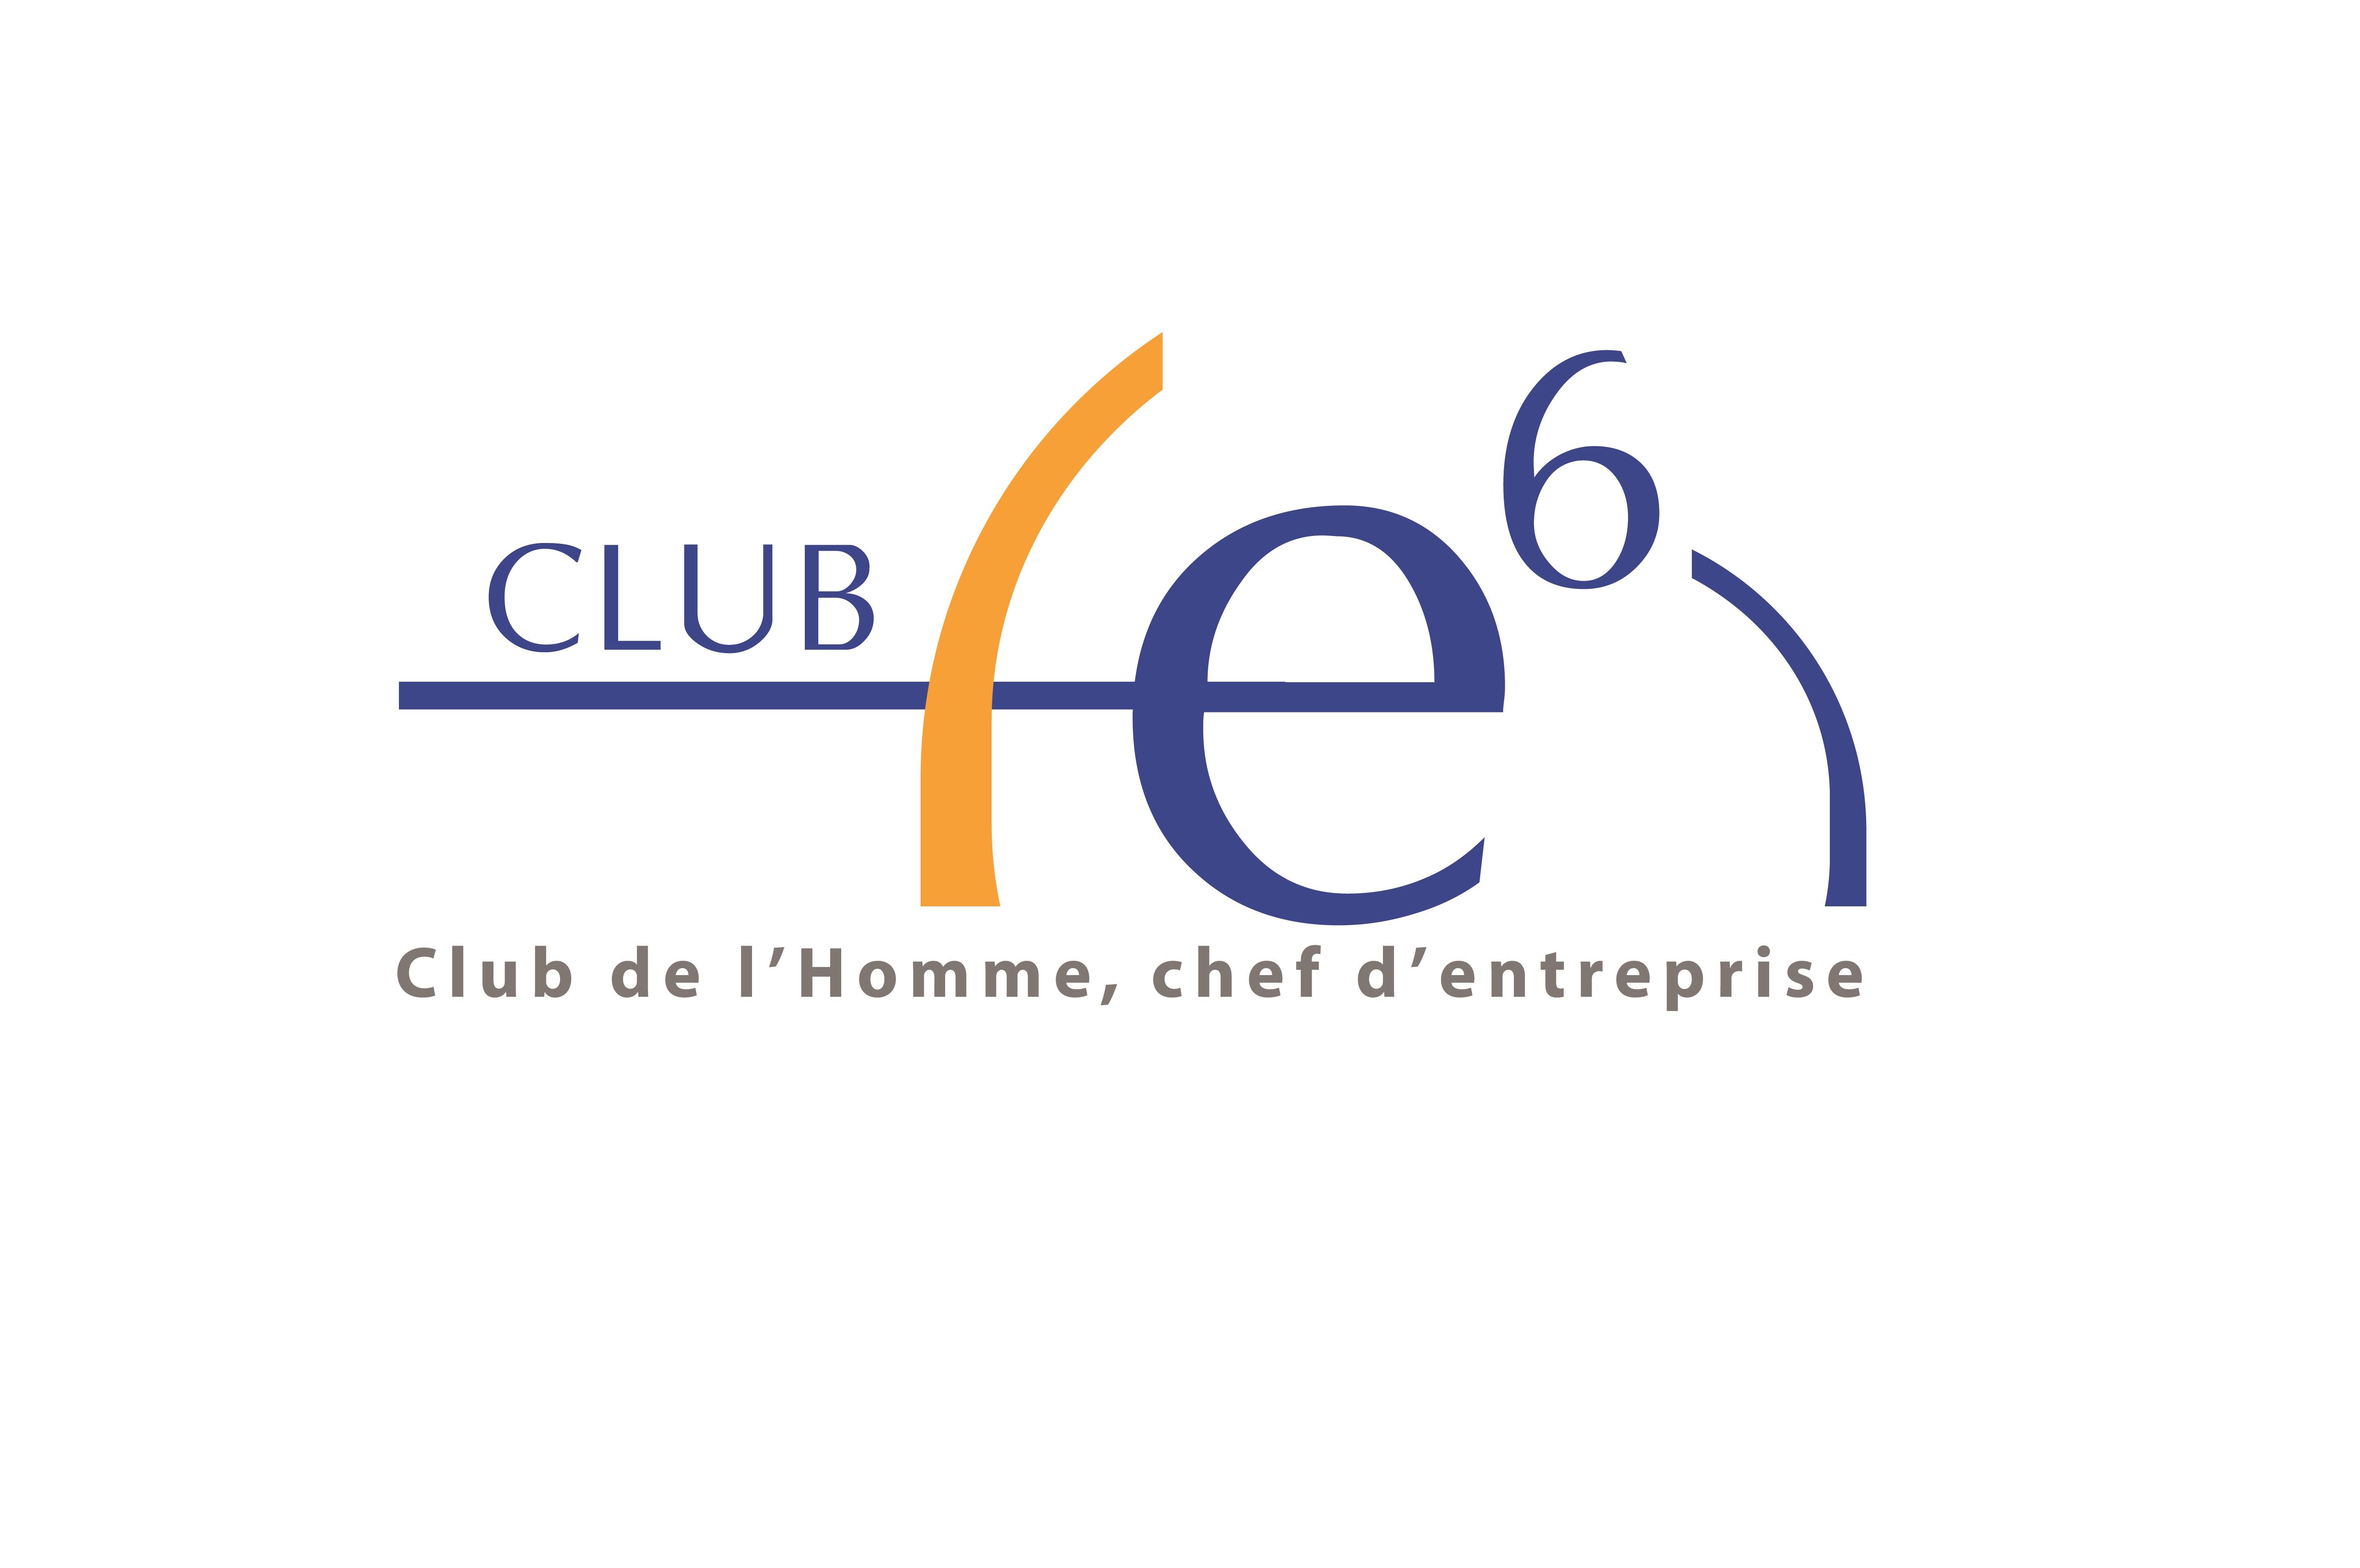 logo_ClubE6